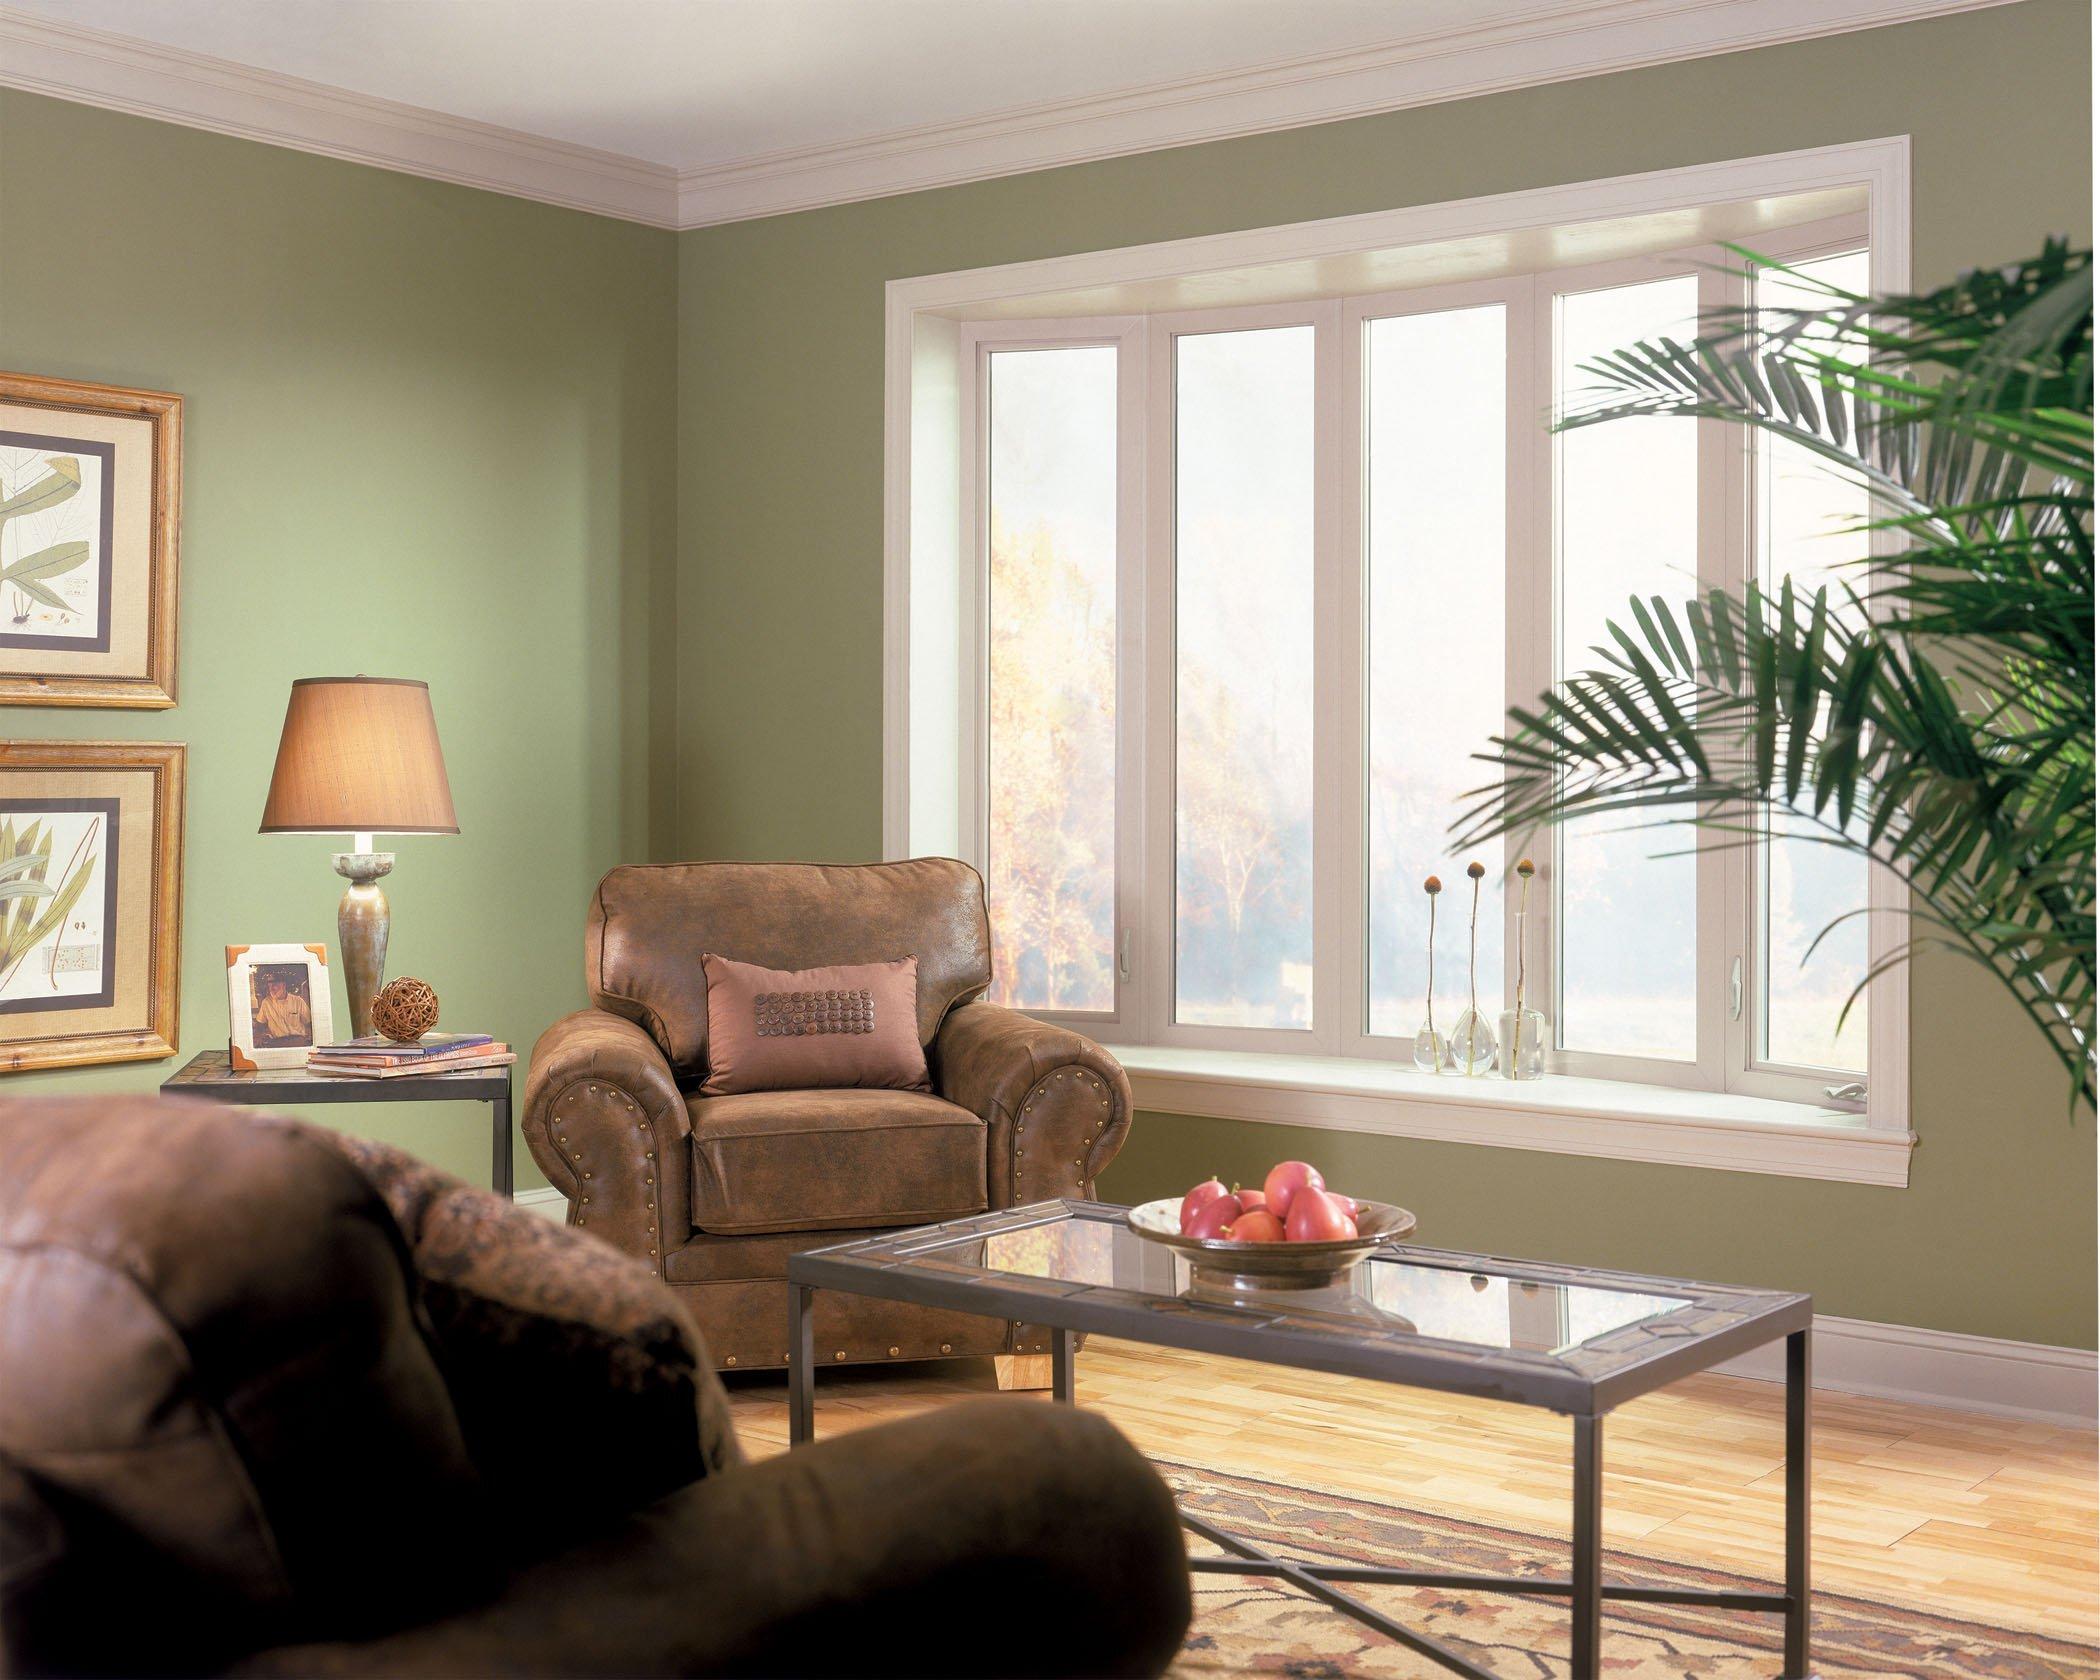 Sound Insulation With New Windows